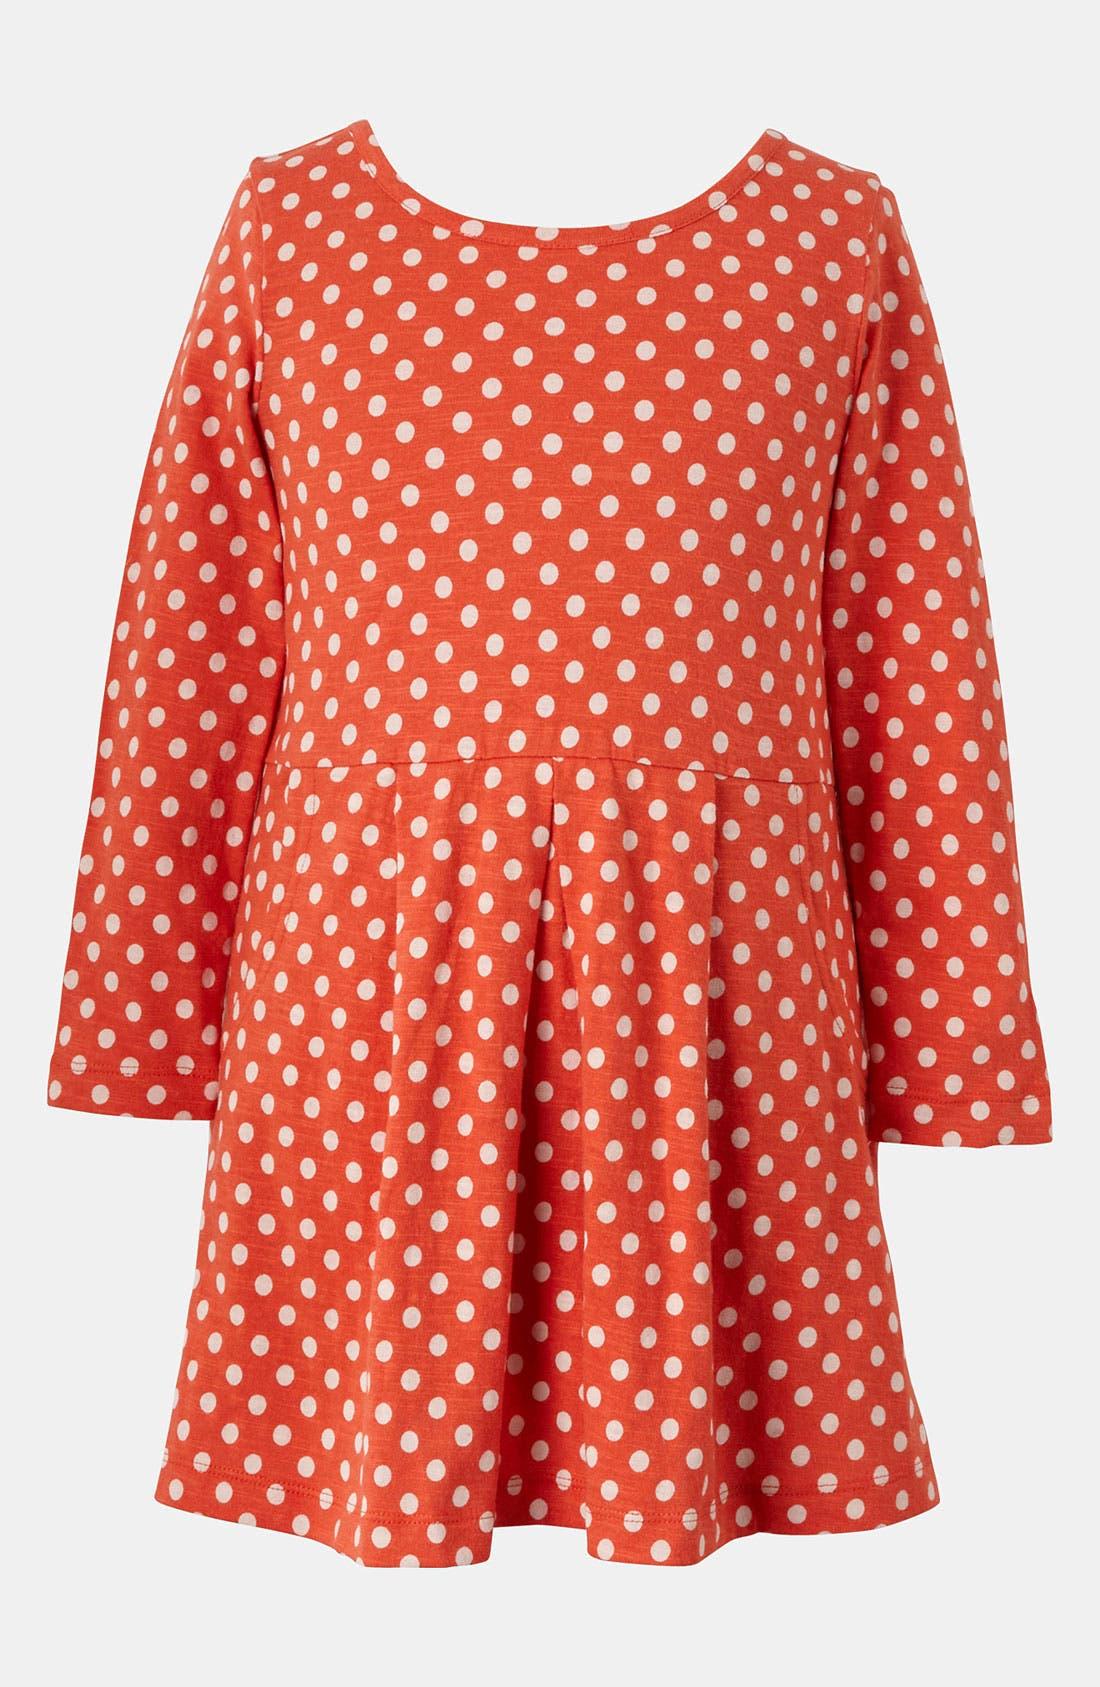 Alternate Image 1 Selected - Mini Boden 'Slouchy' Jersey Dress (Little Girls & Big Girls)